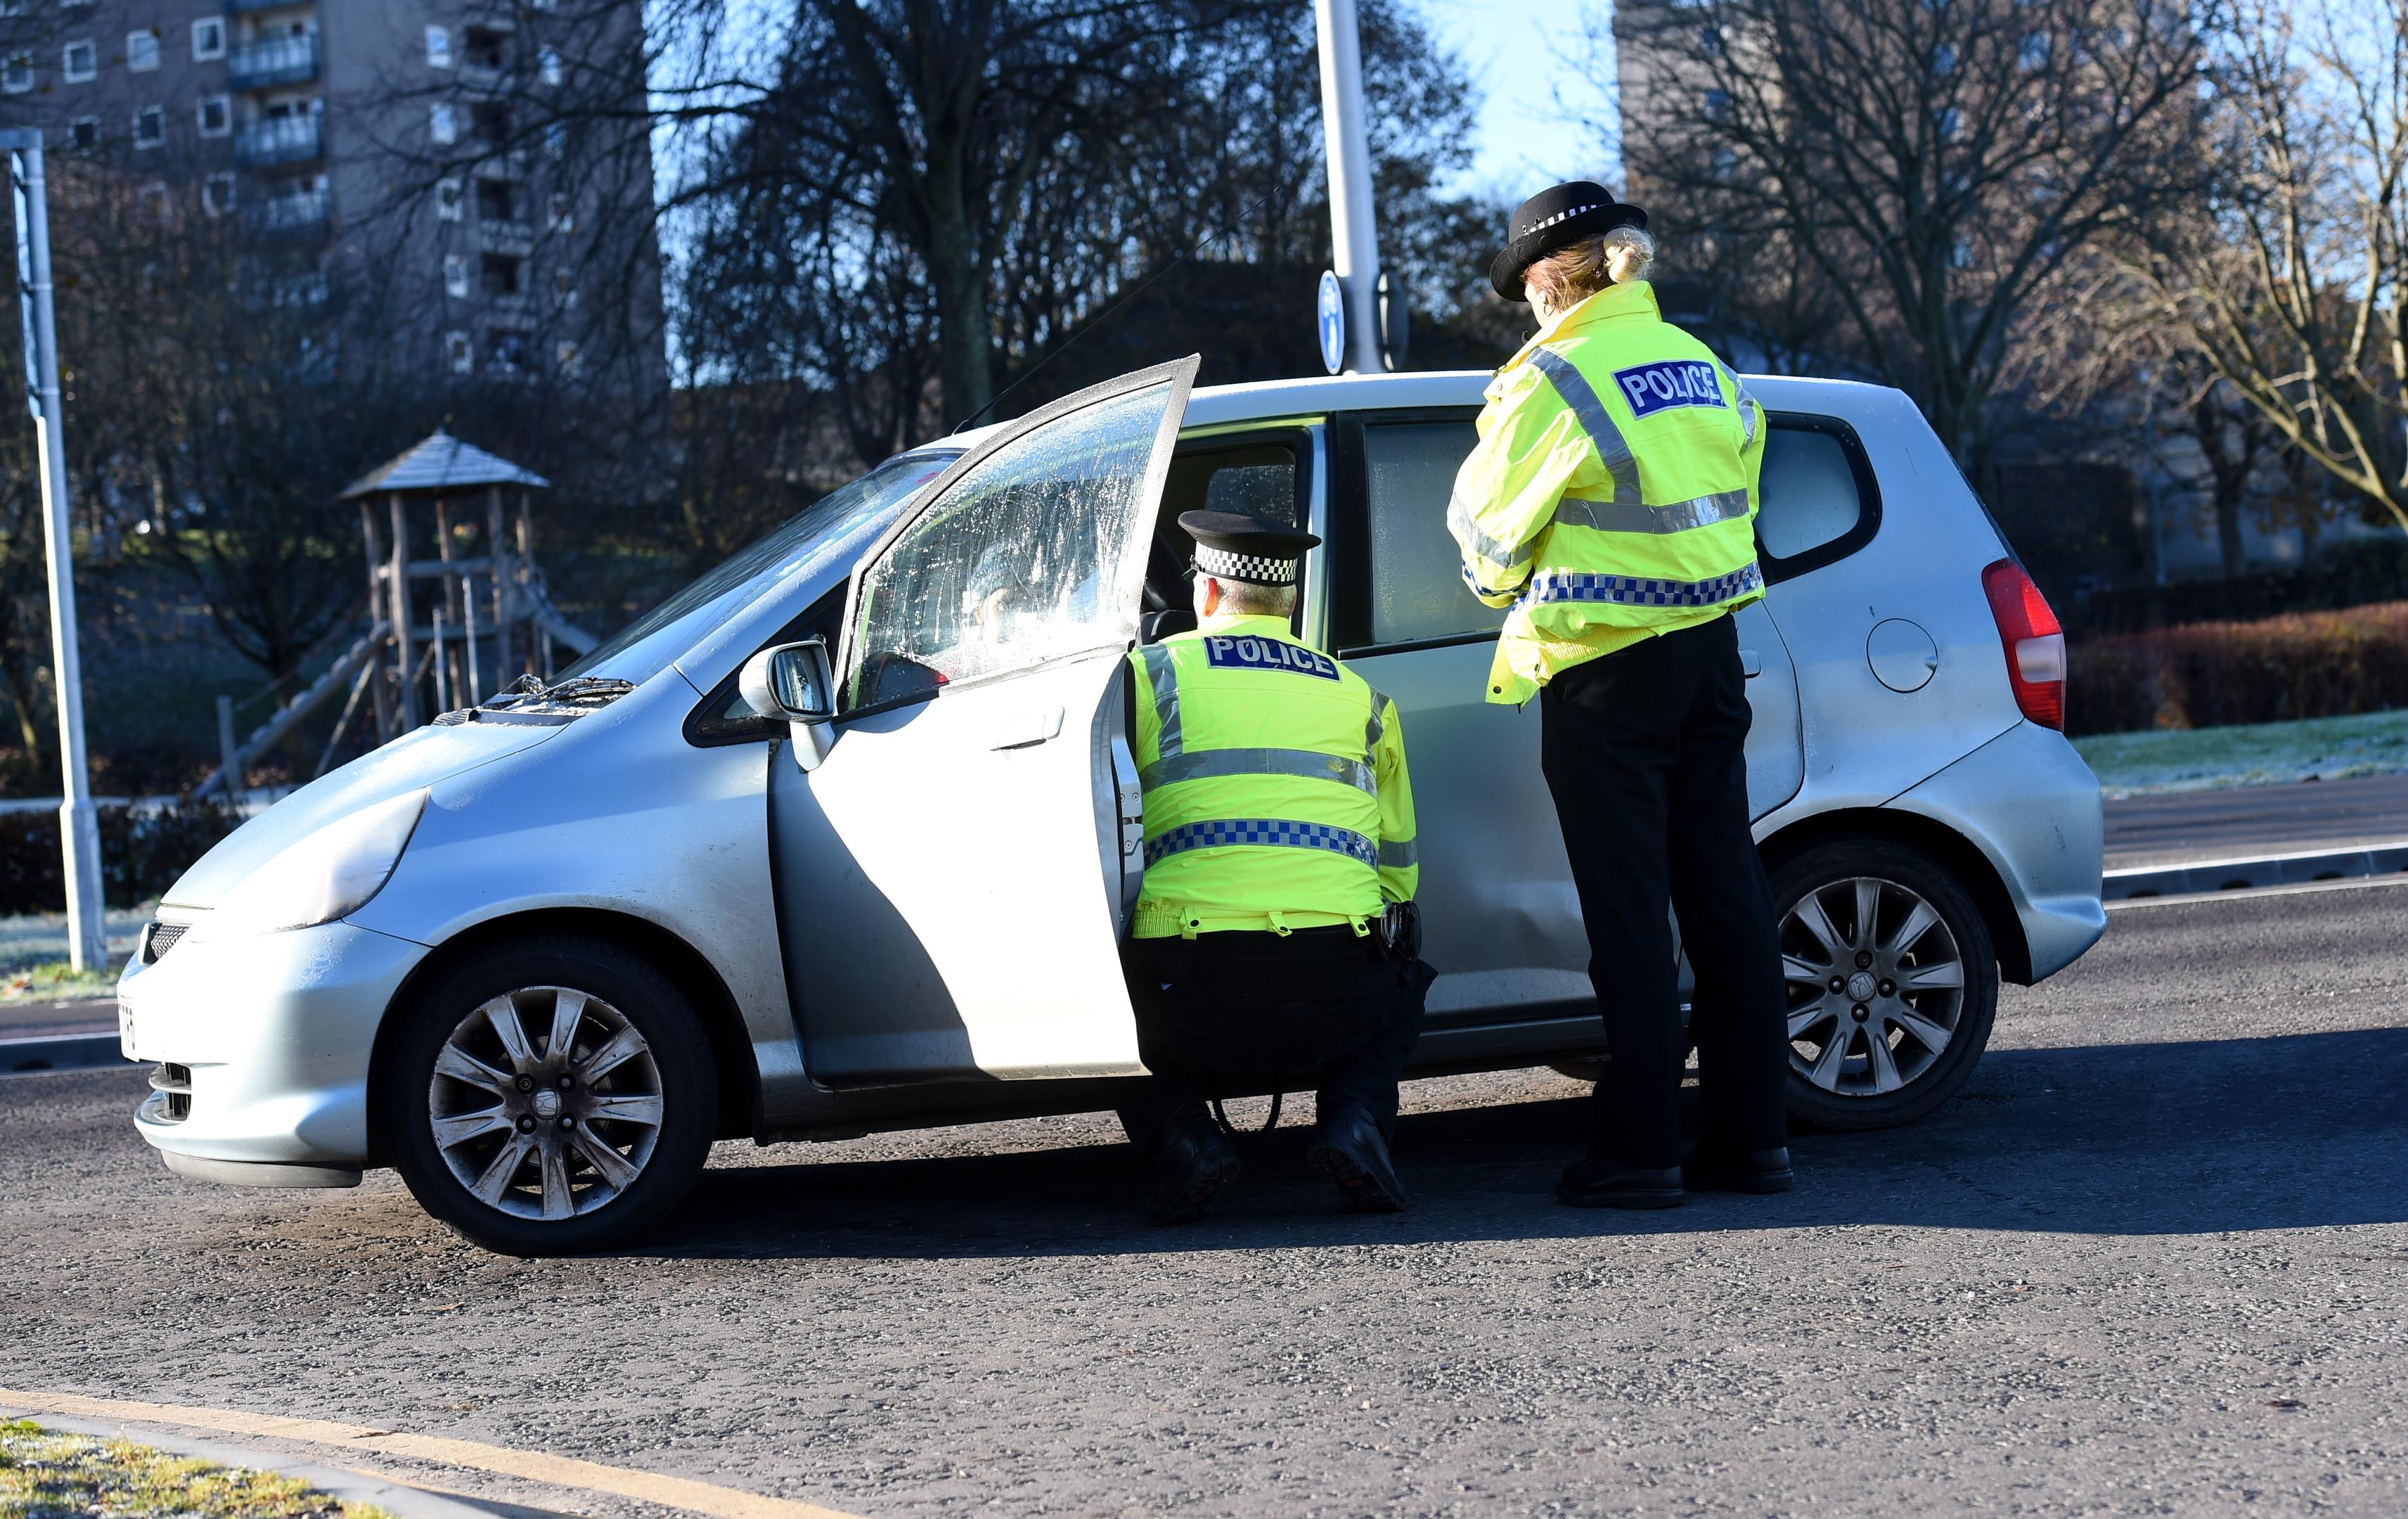 Pc Stuart Gordon and Pc Elizabeth Gibson talk to a driver.